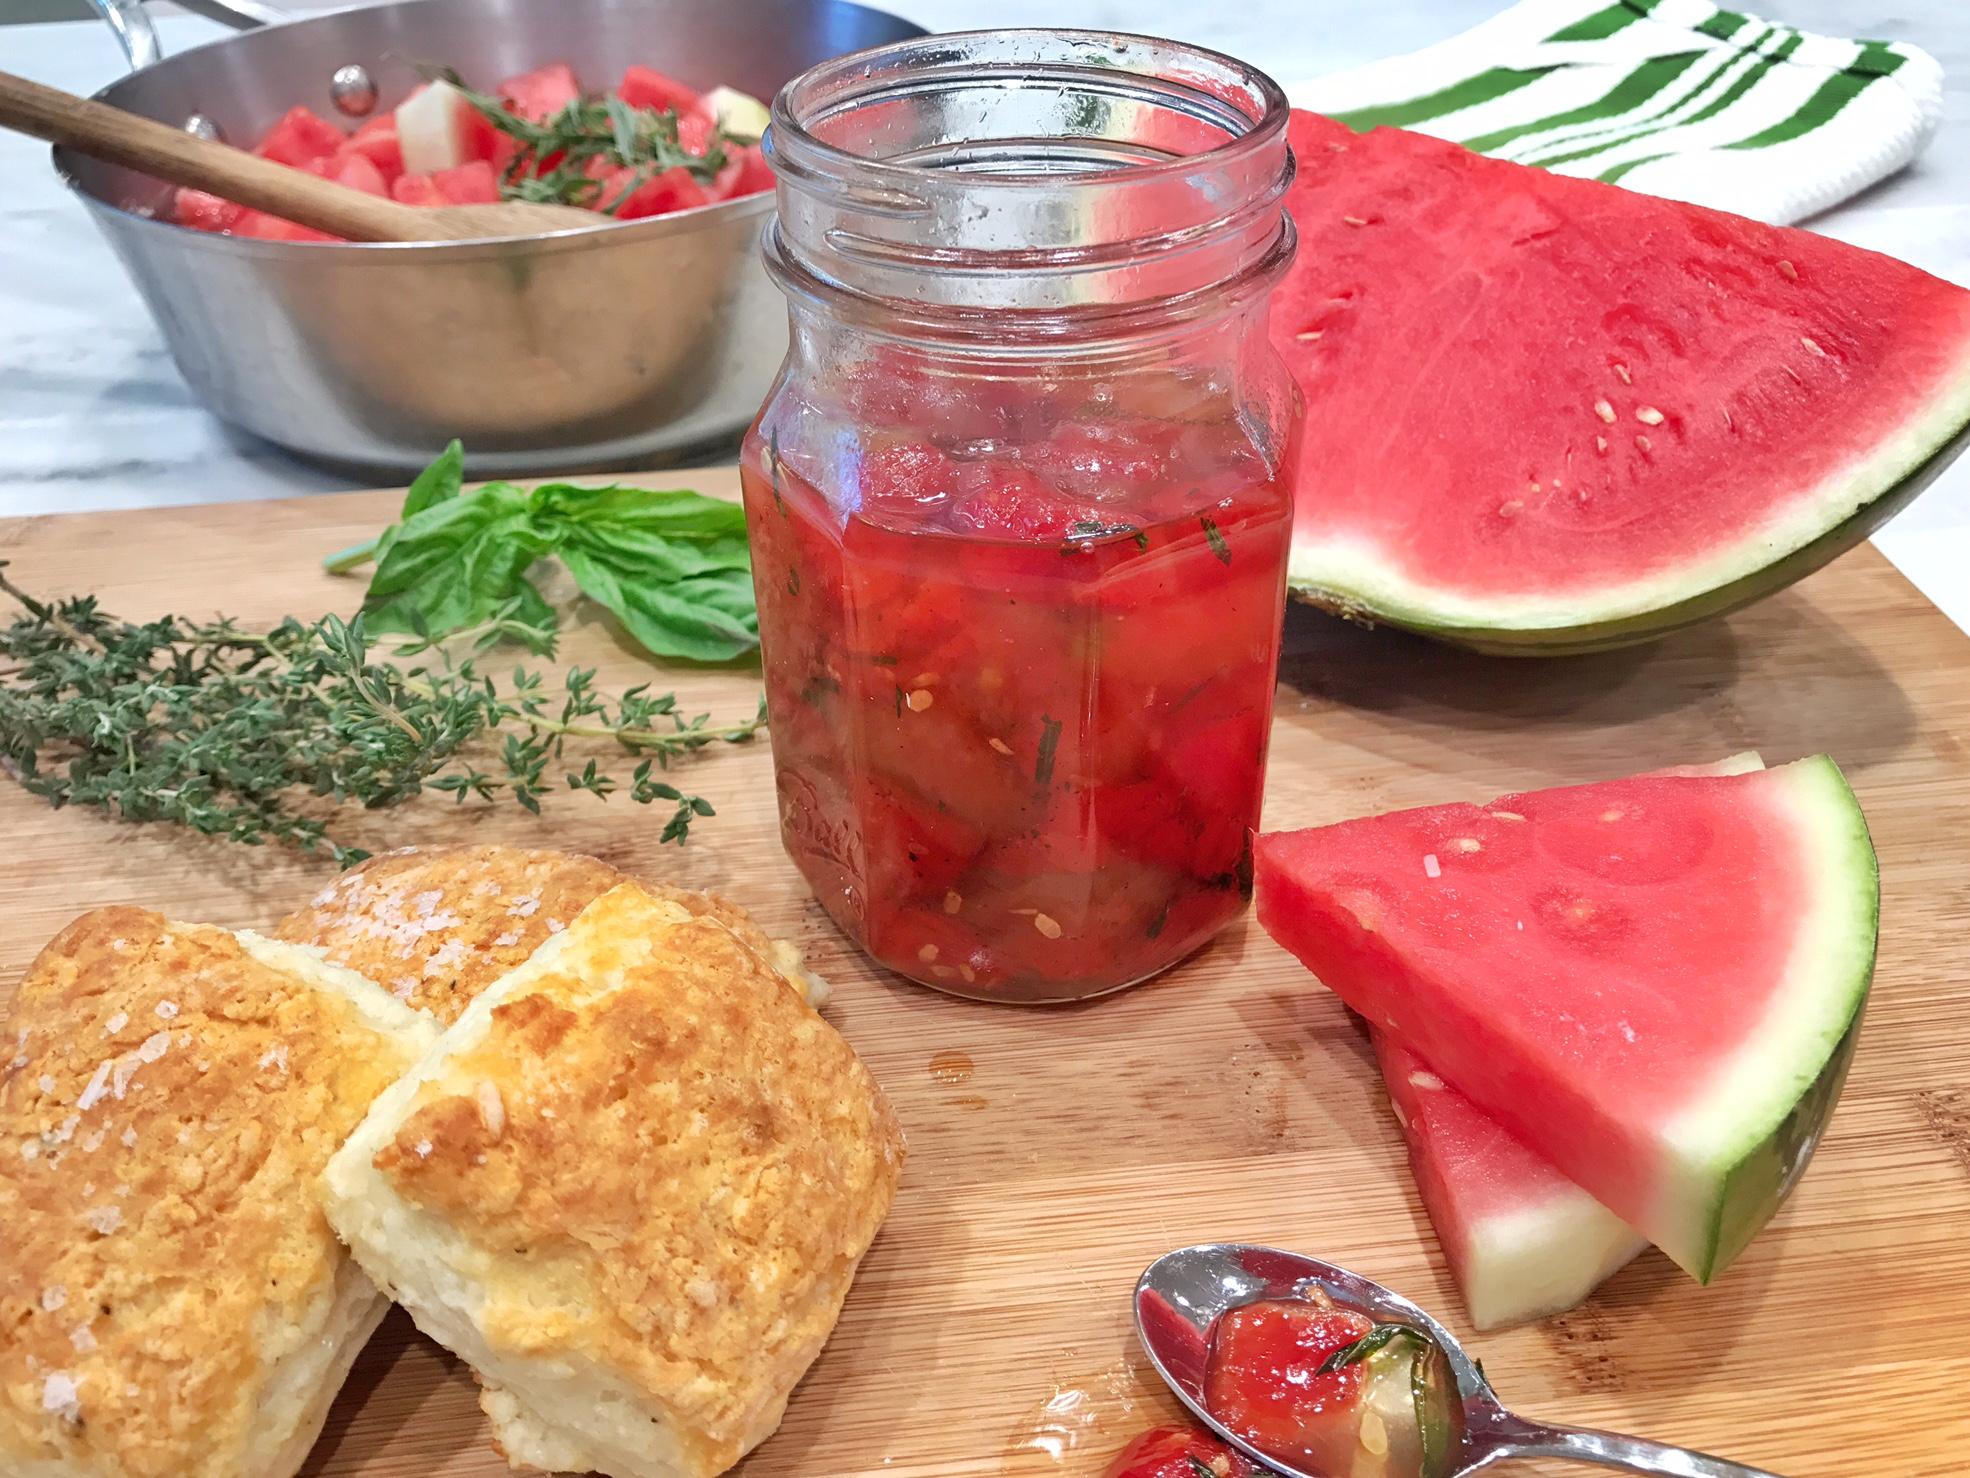 watermelon-spoon-jam-image